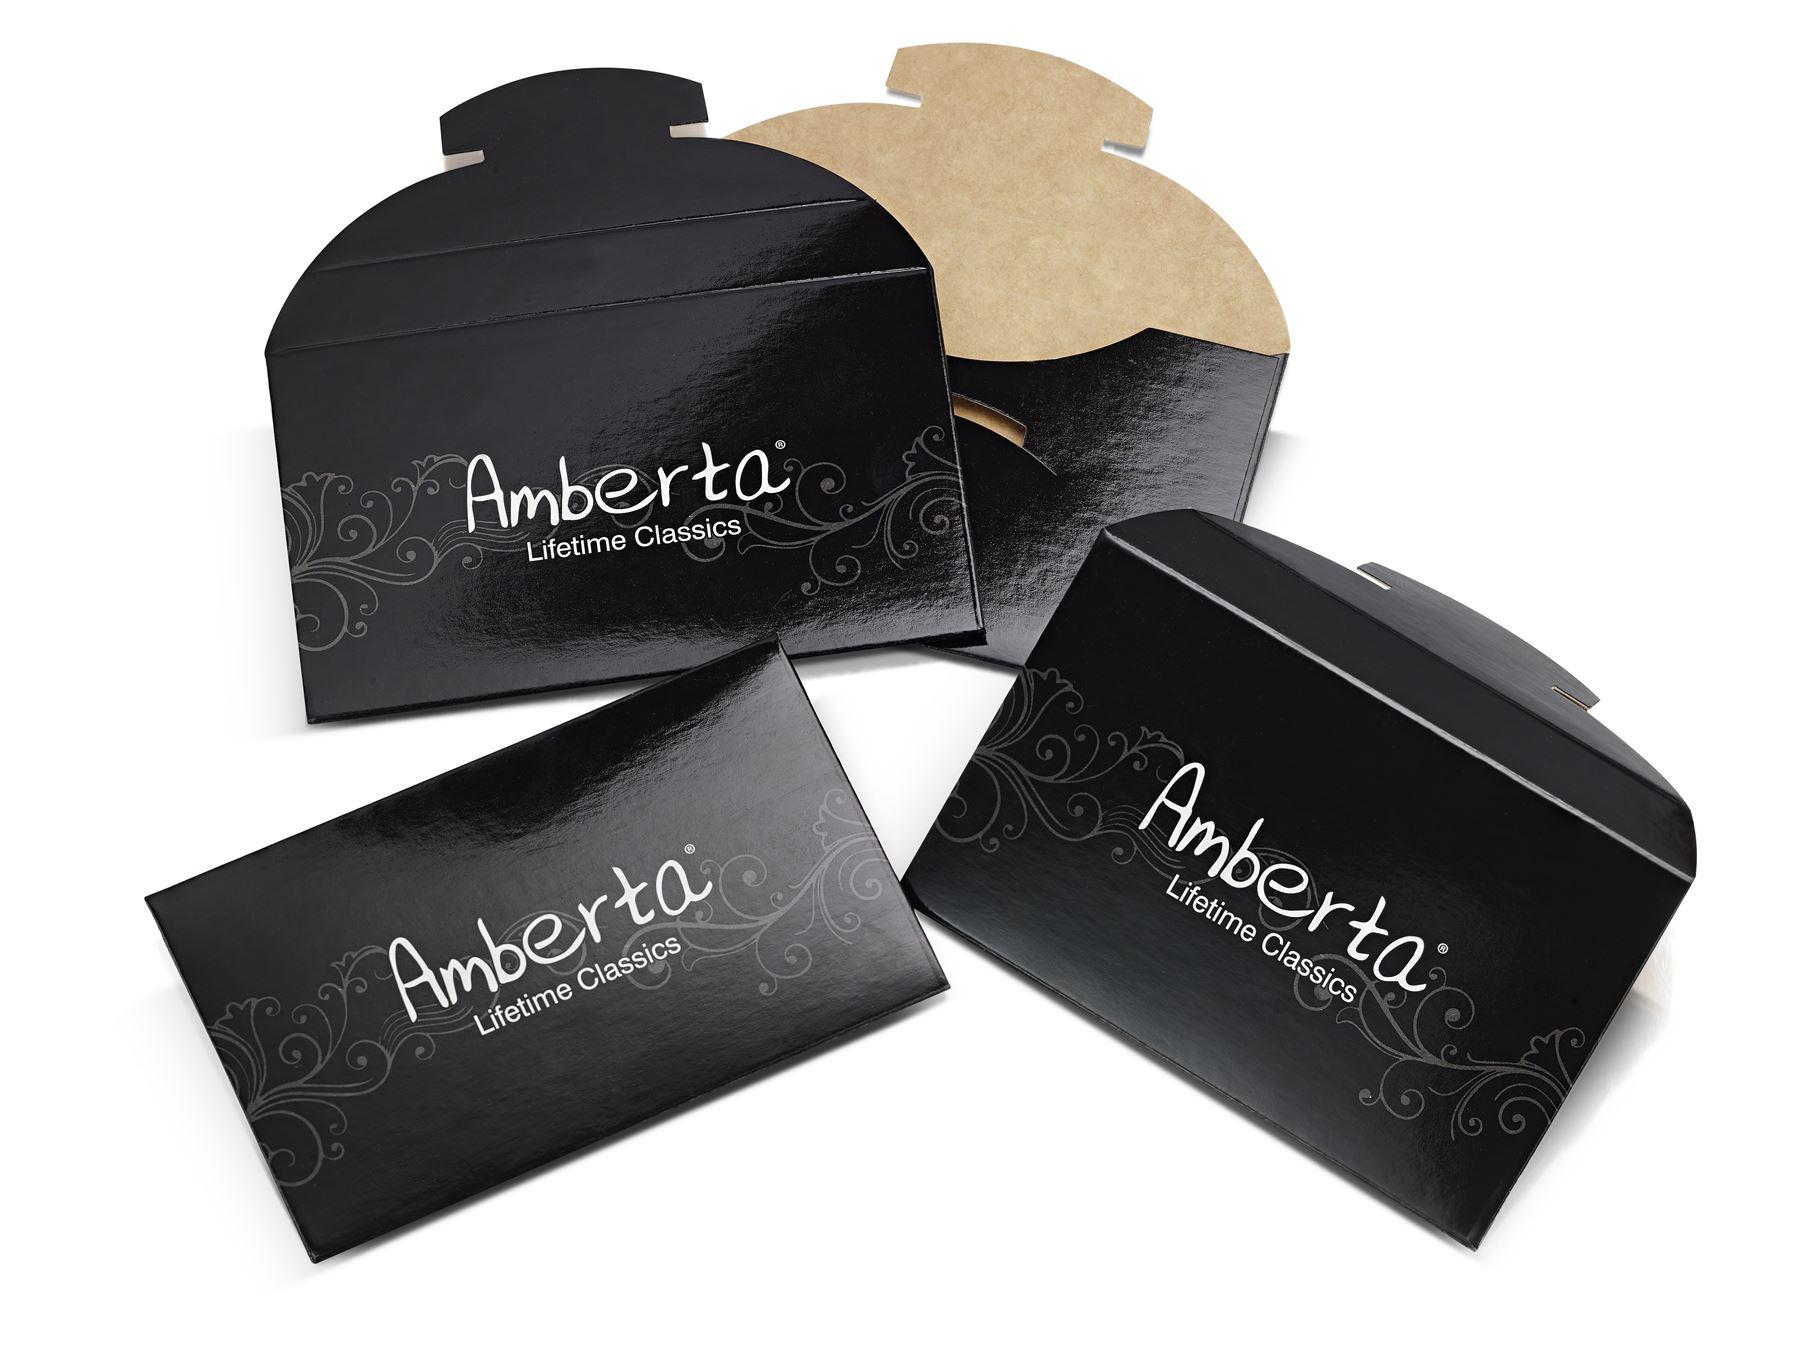 Amberta-Jewelry-925-Sterling-Silver-Adjustable-Bracelet-Italian-Bangle-for-Women miniature 16